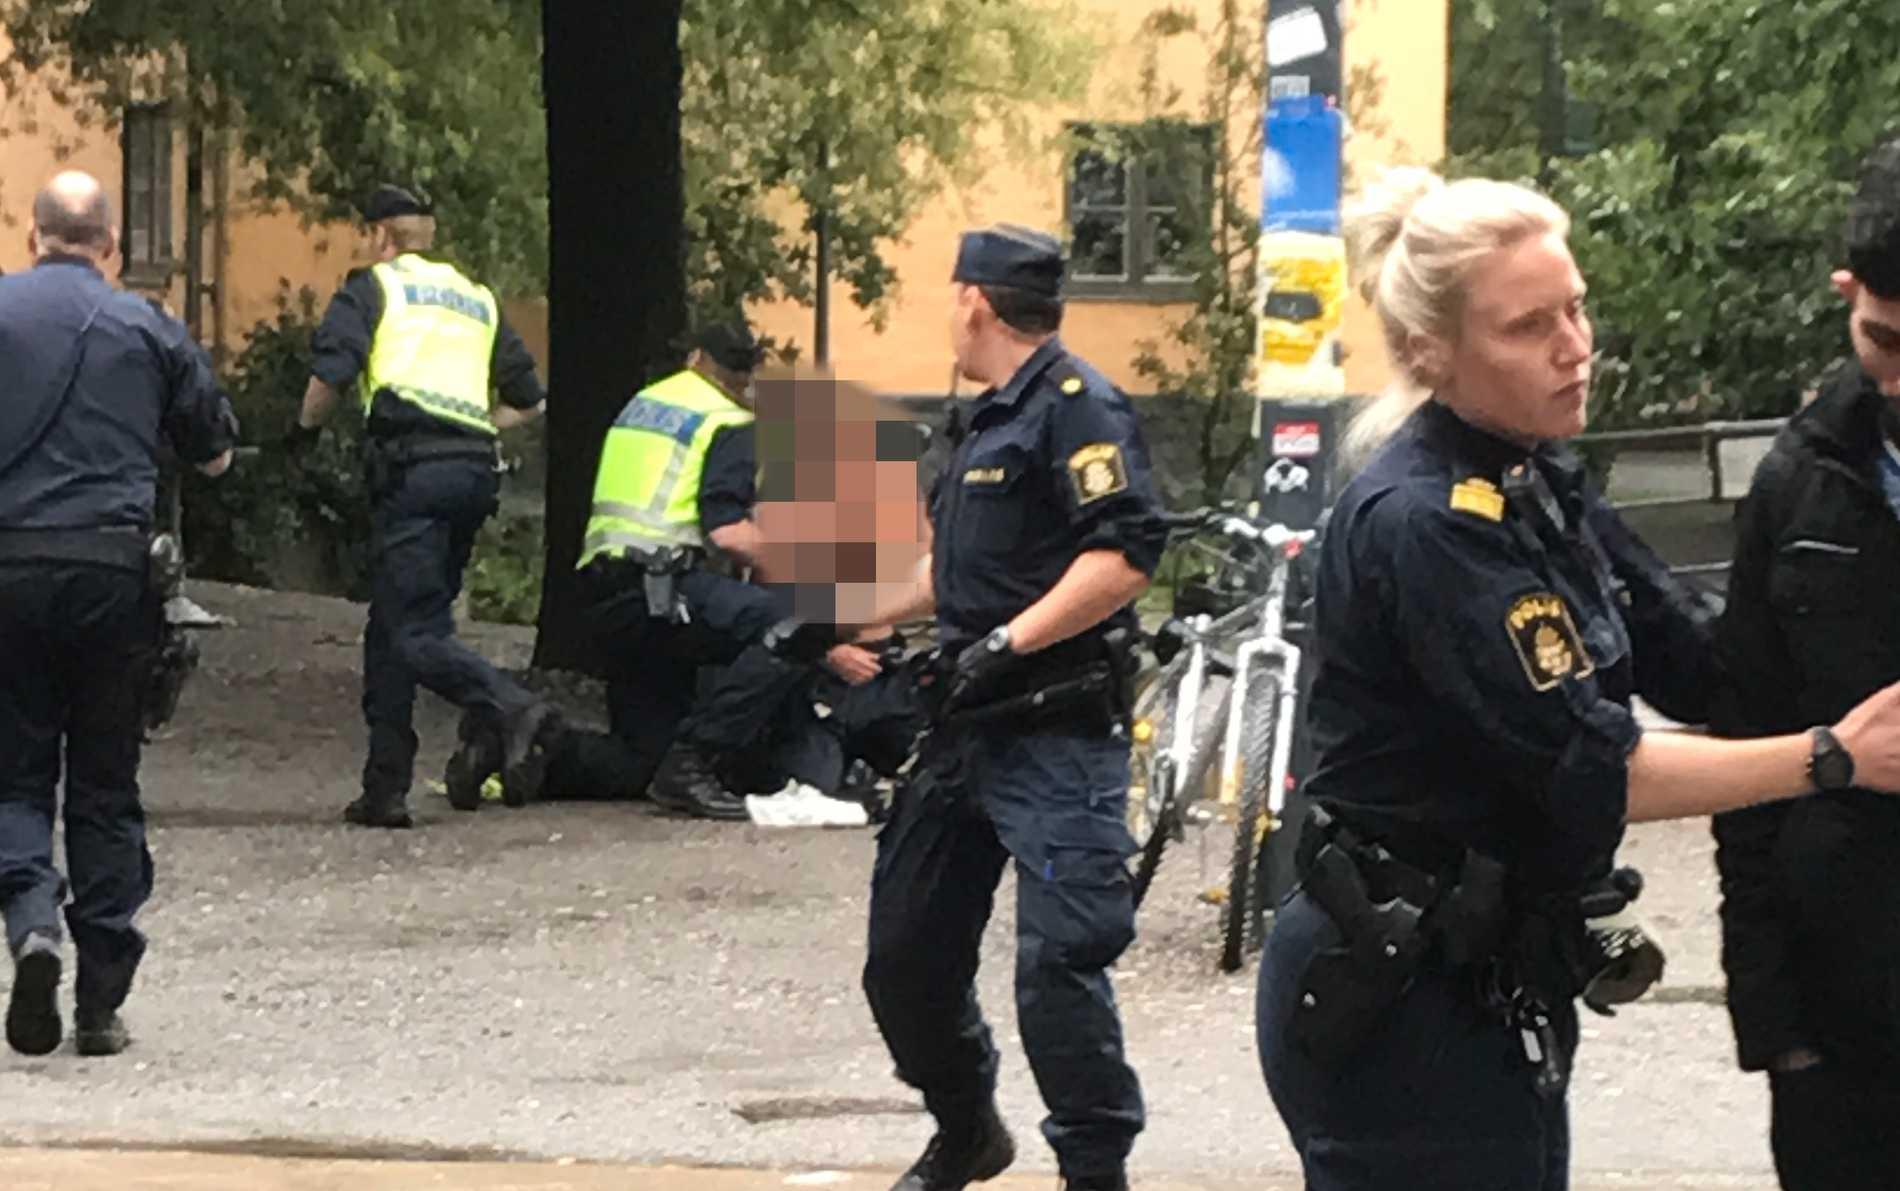 Den skadade polisen tas omhand.